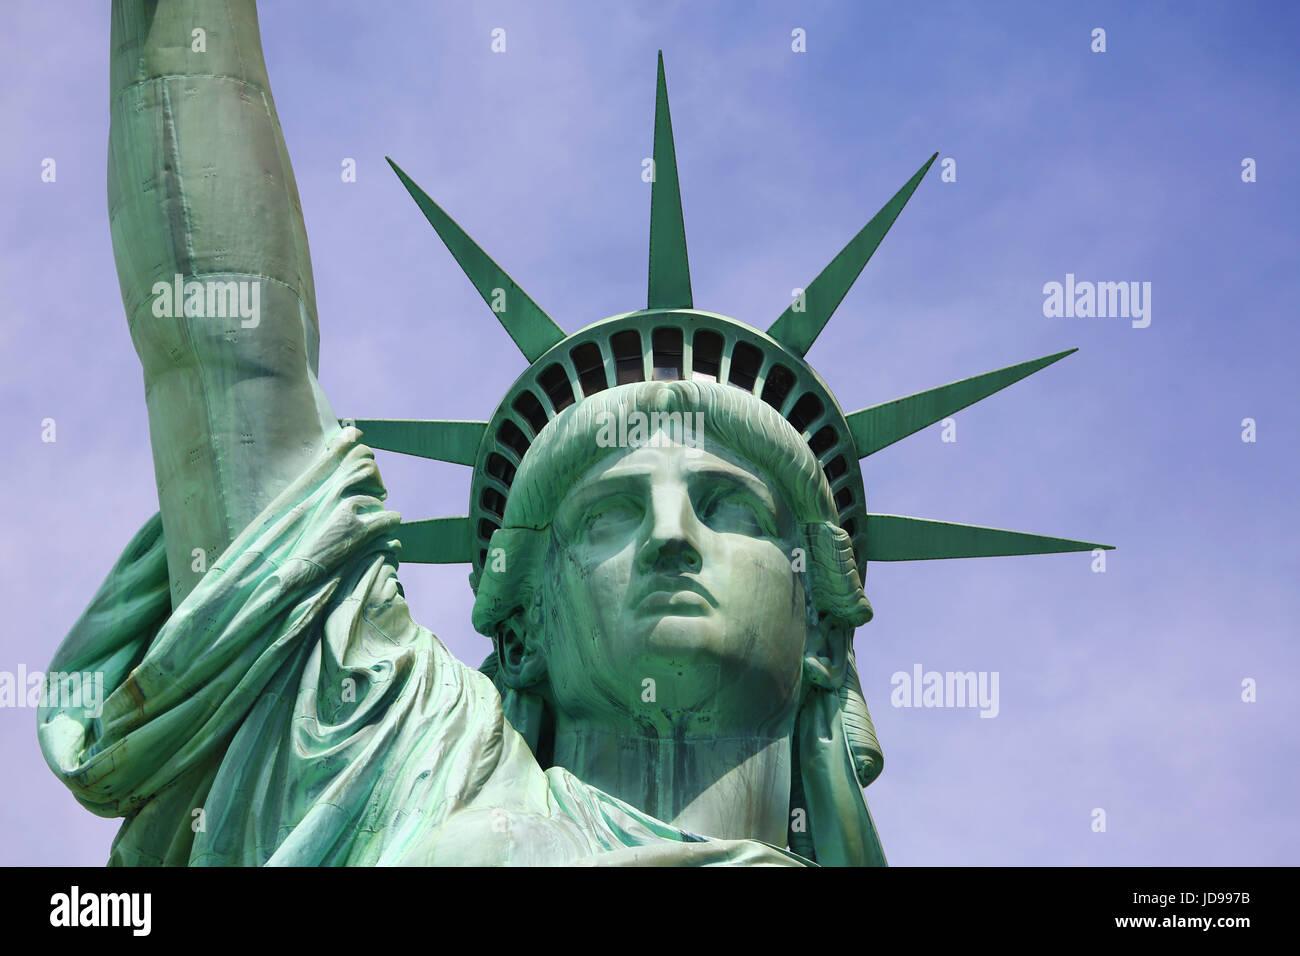 The Statue of Liberty, New York City, New York, USA - Stock Image